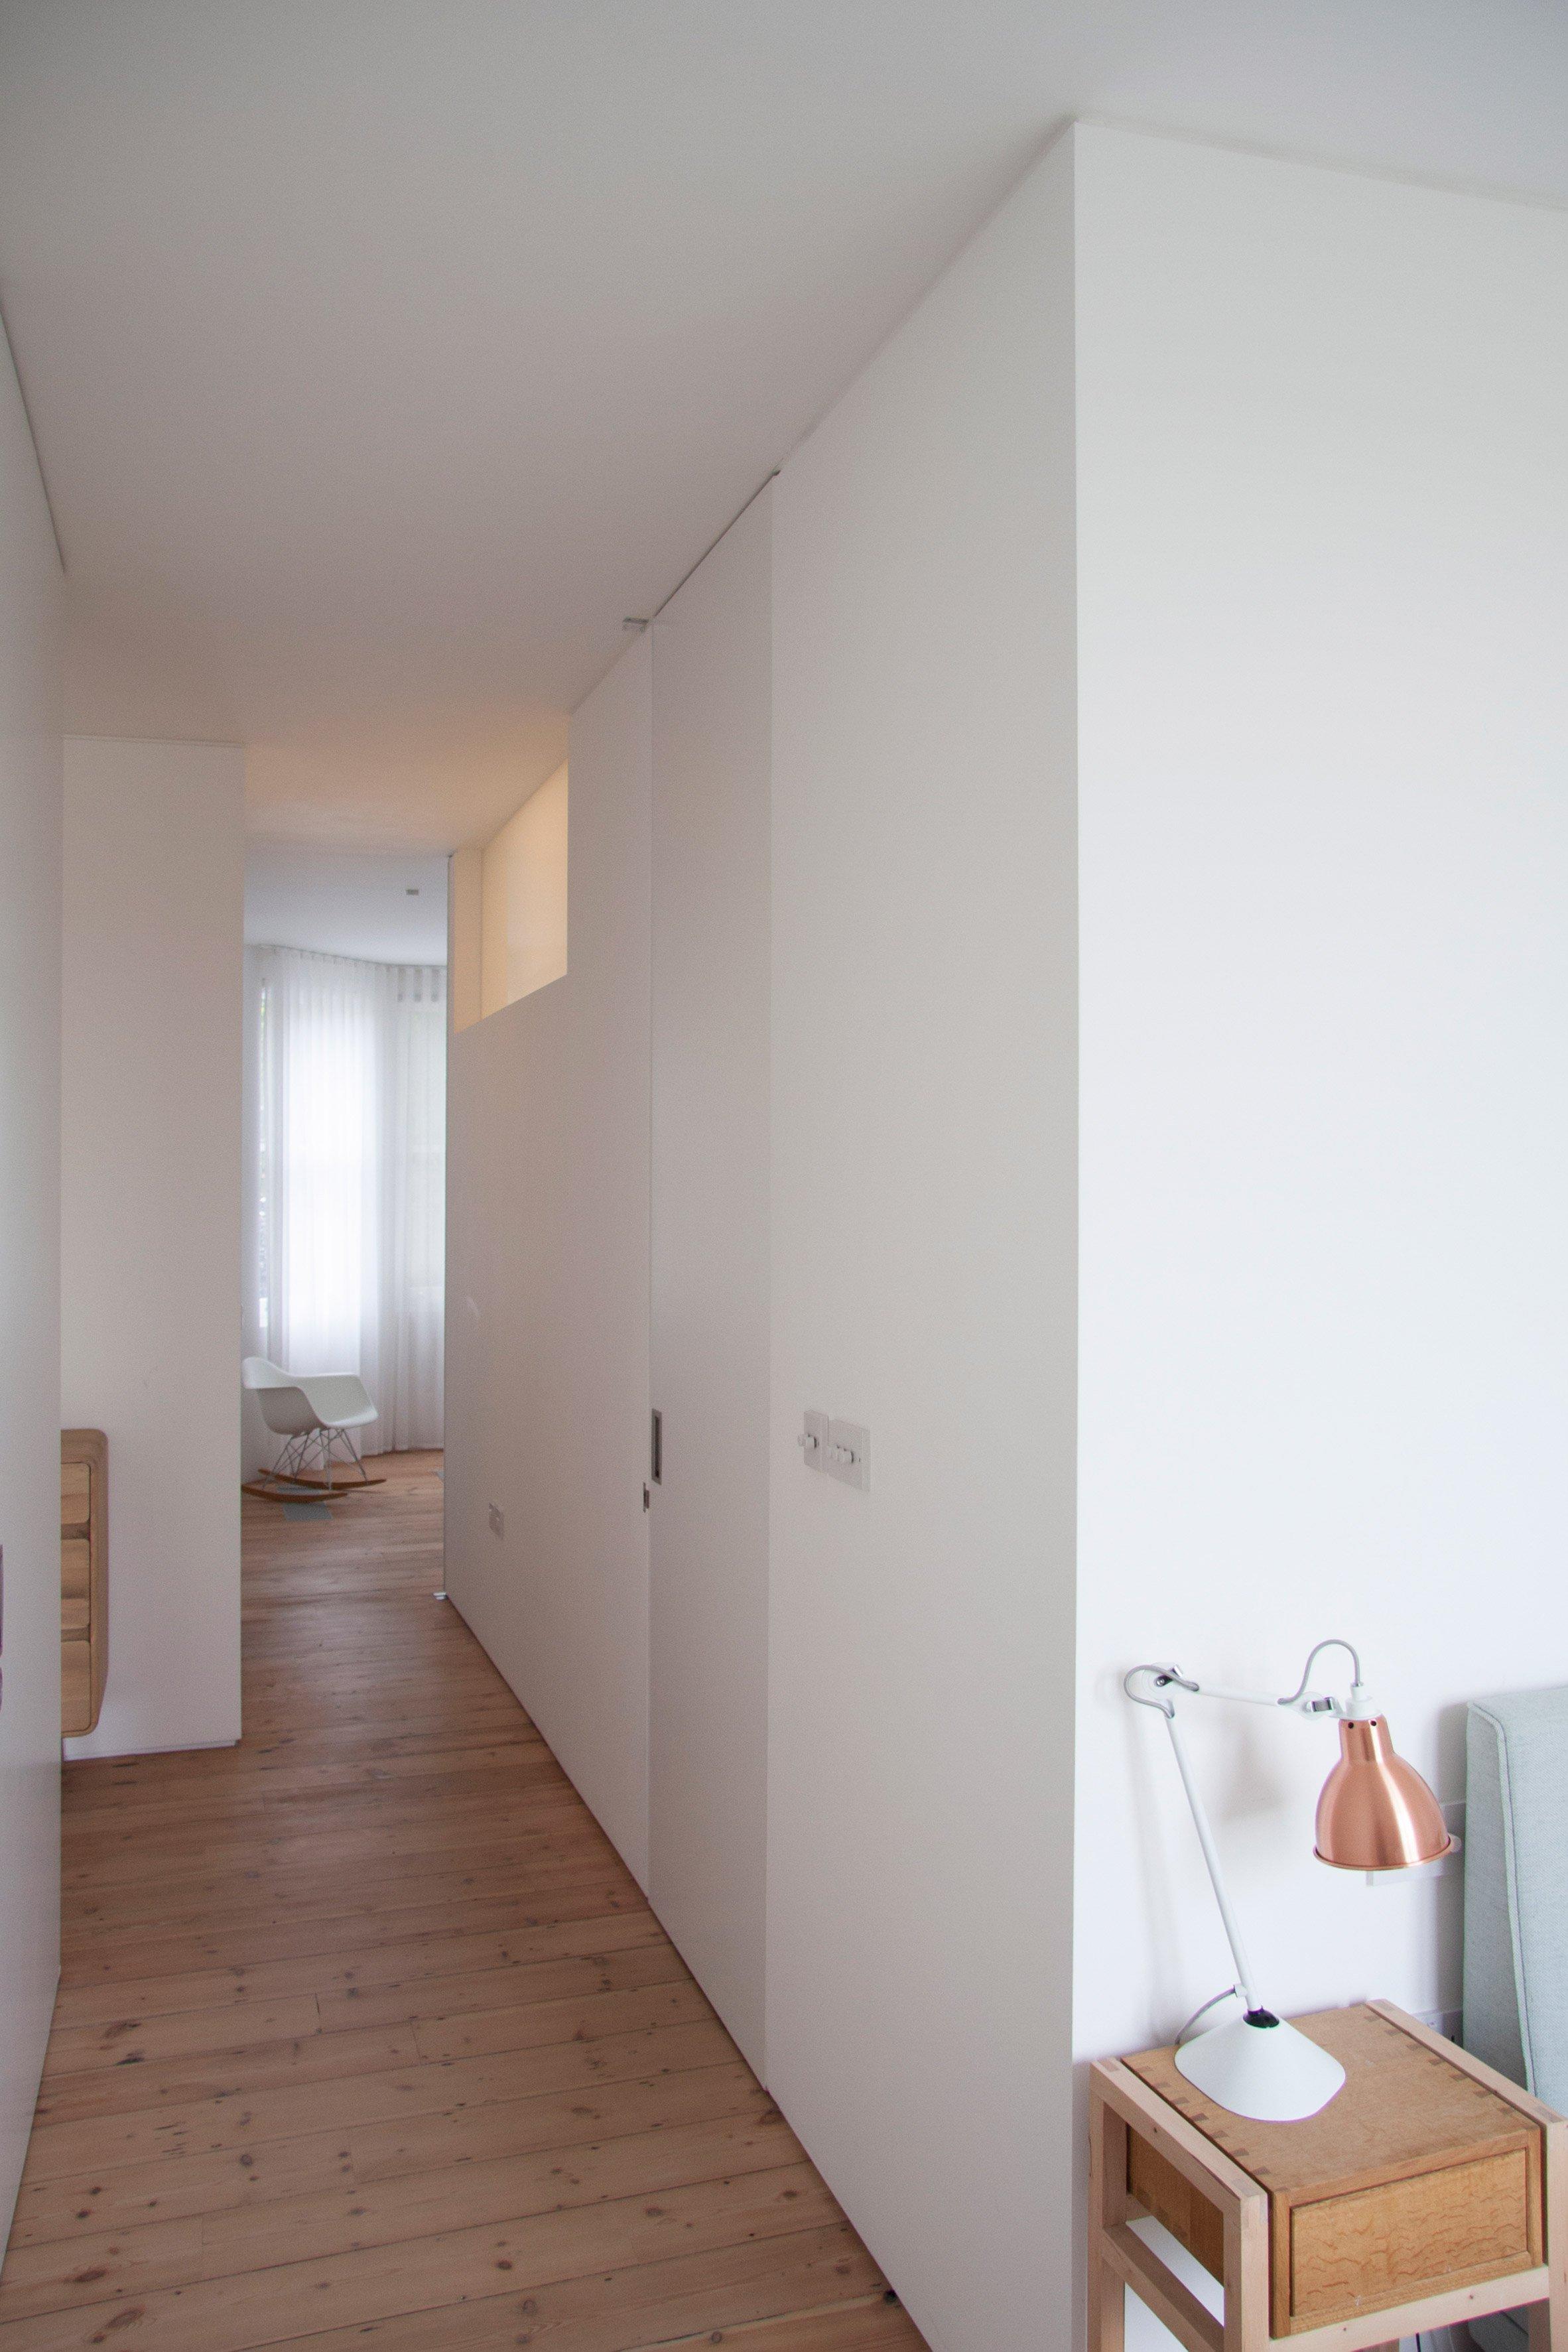 architecture-square-residence-interiors-design-studia-osnovadesign-osnova-poltava_12